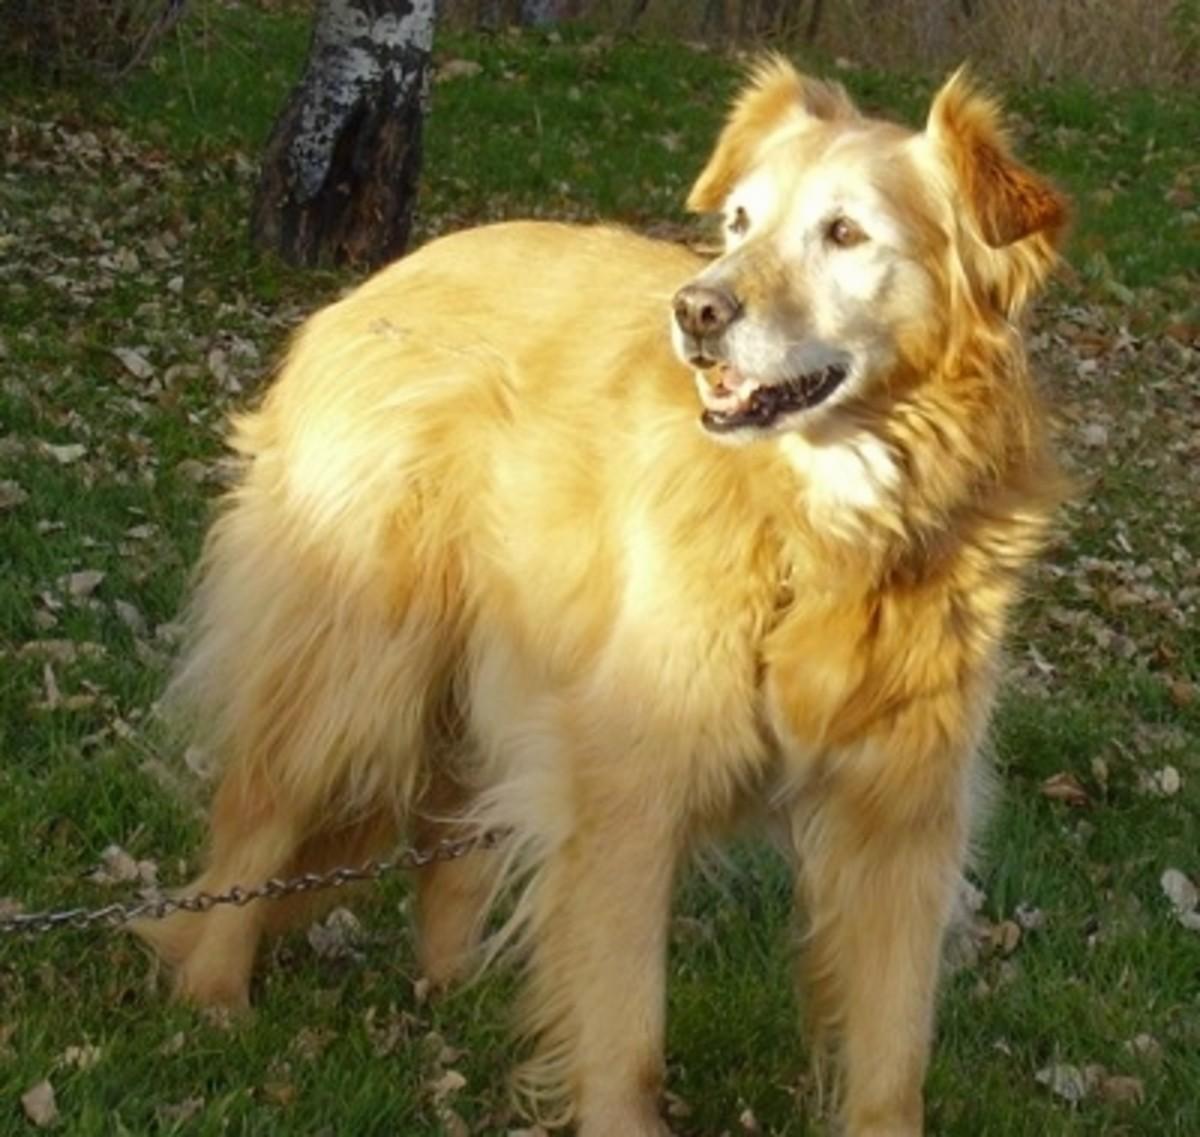 Gollie (Collie and Golden Retriever mix)